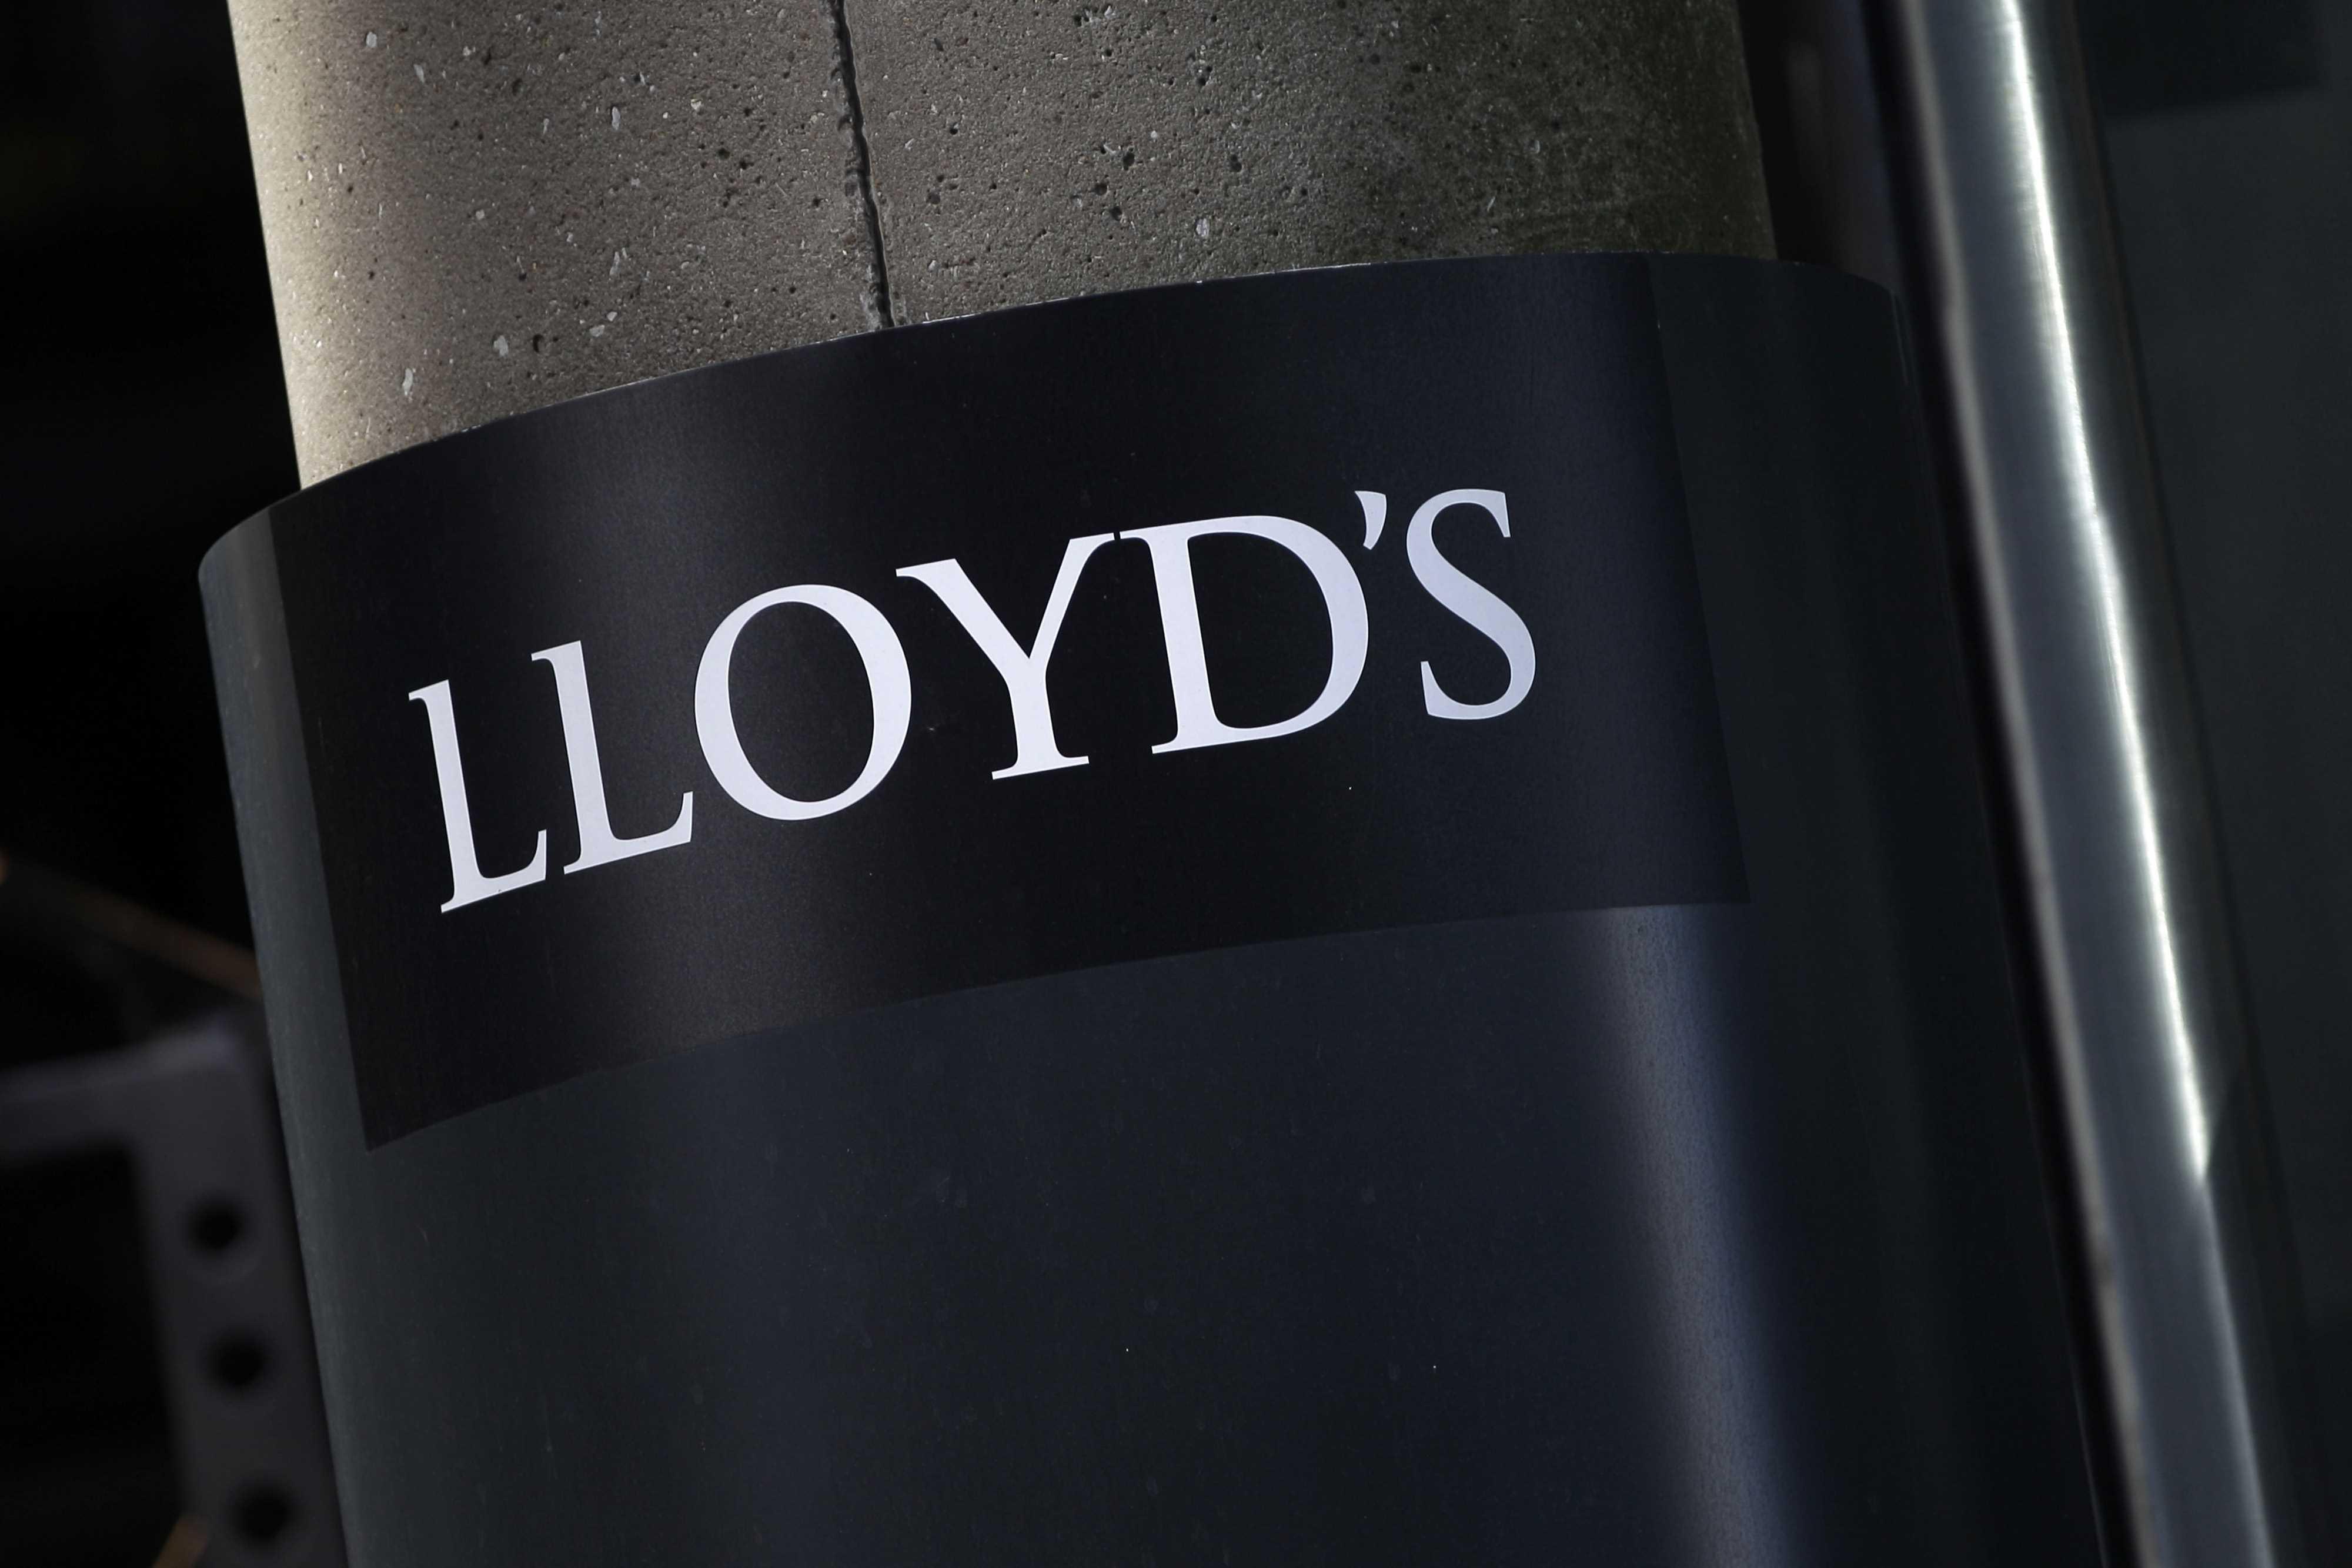 Lloyd's of London unveils long-term strategic initiative